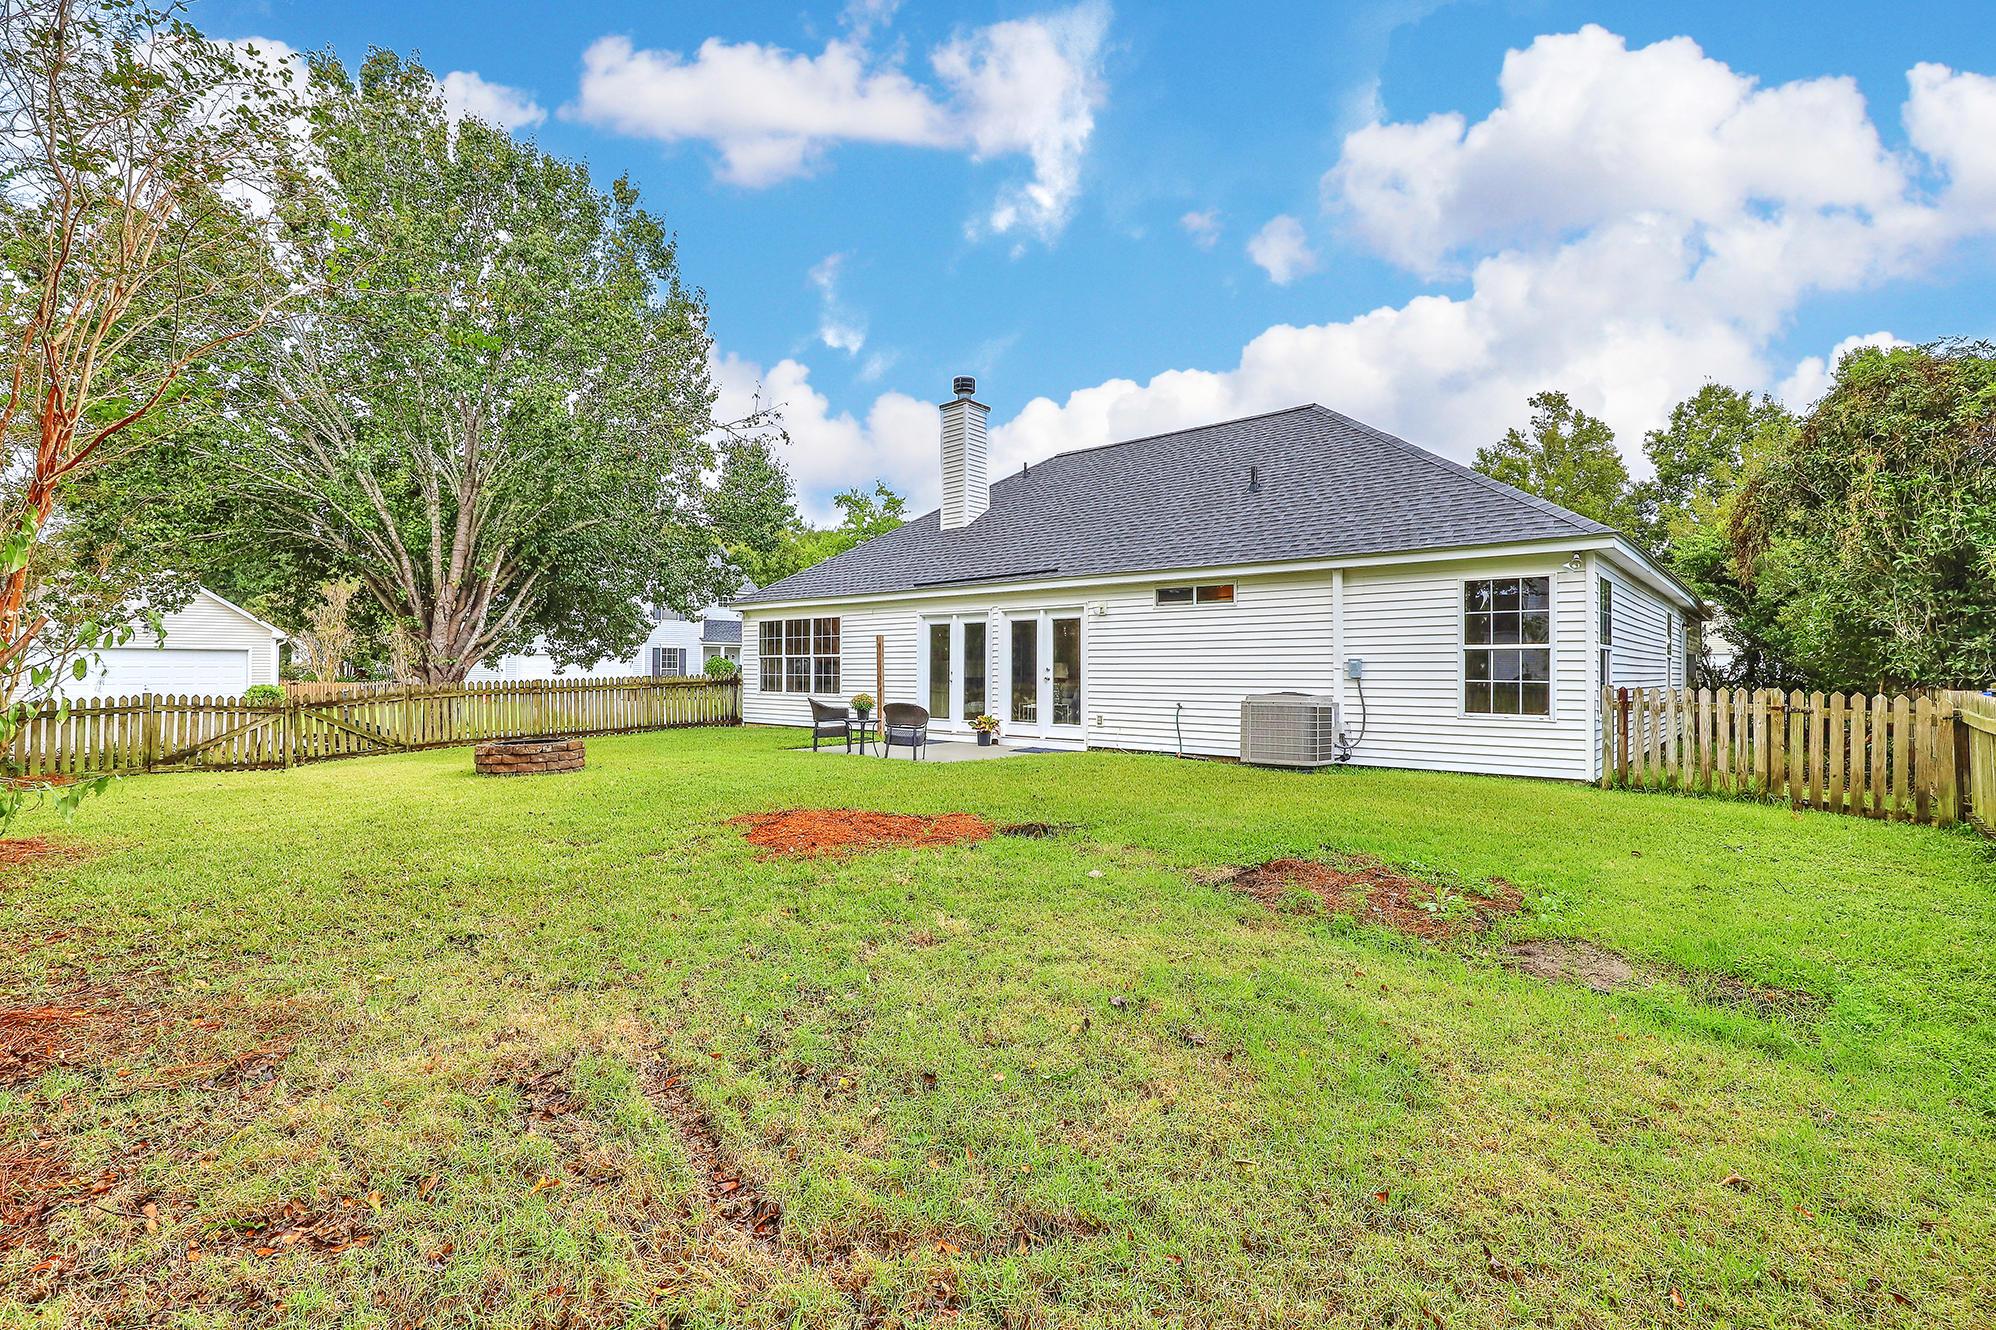 Planters Pointe Homes For Sale - 2951 Loebs, Mount Pleasant, SC - 27